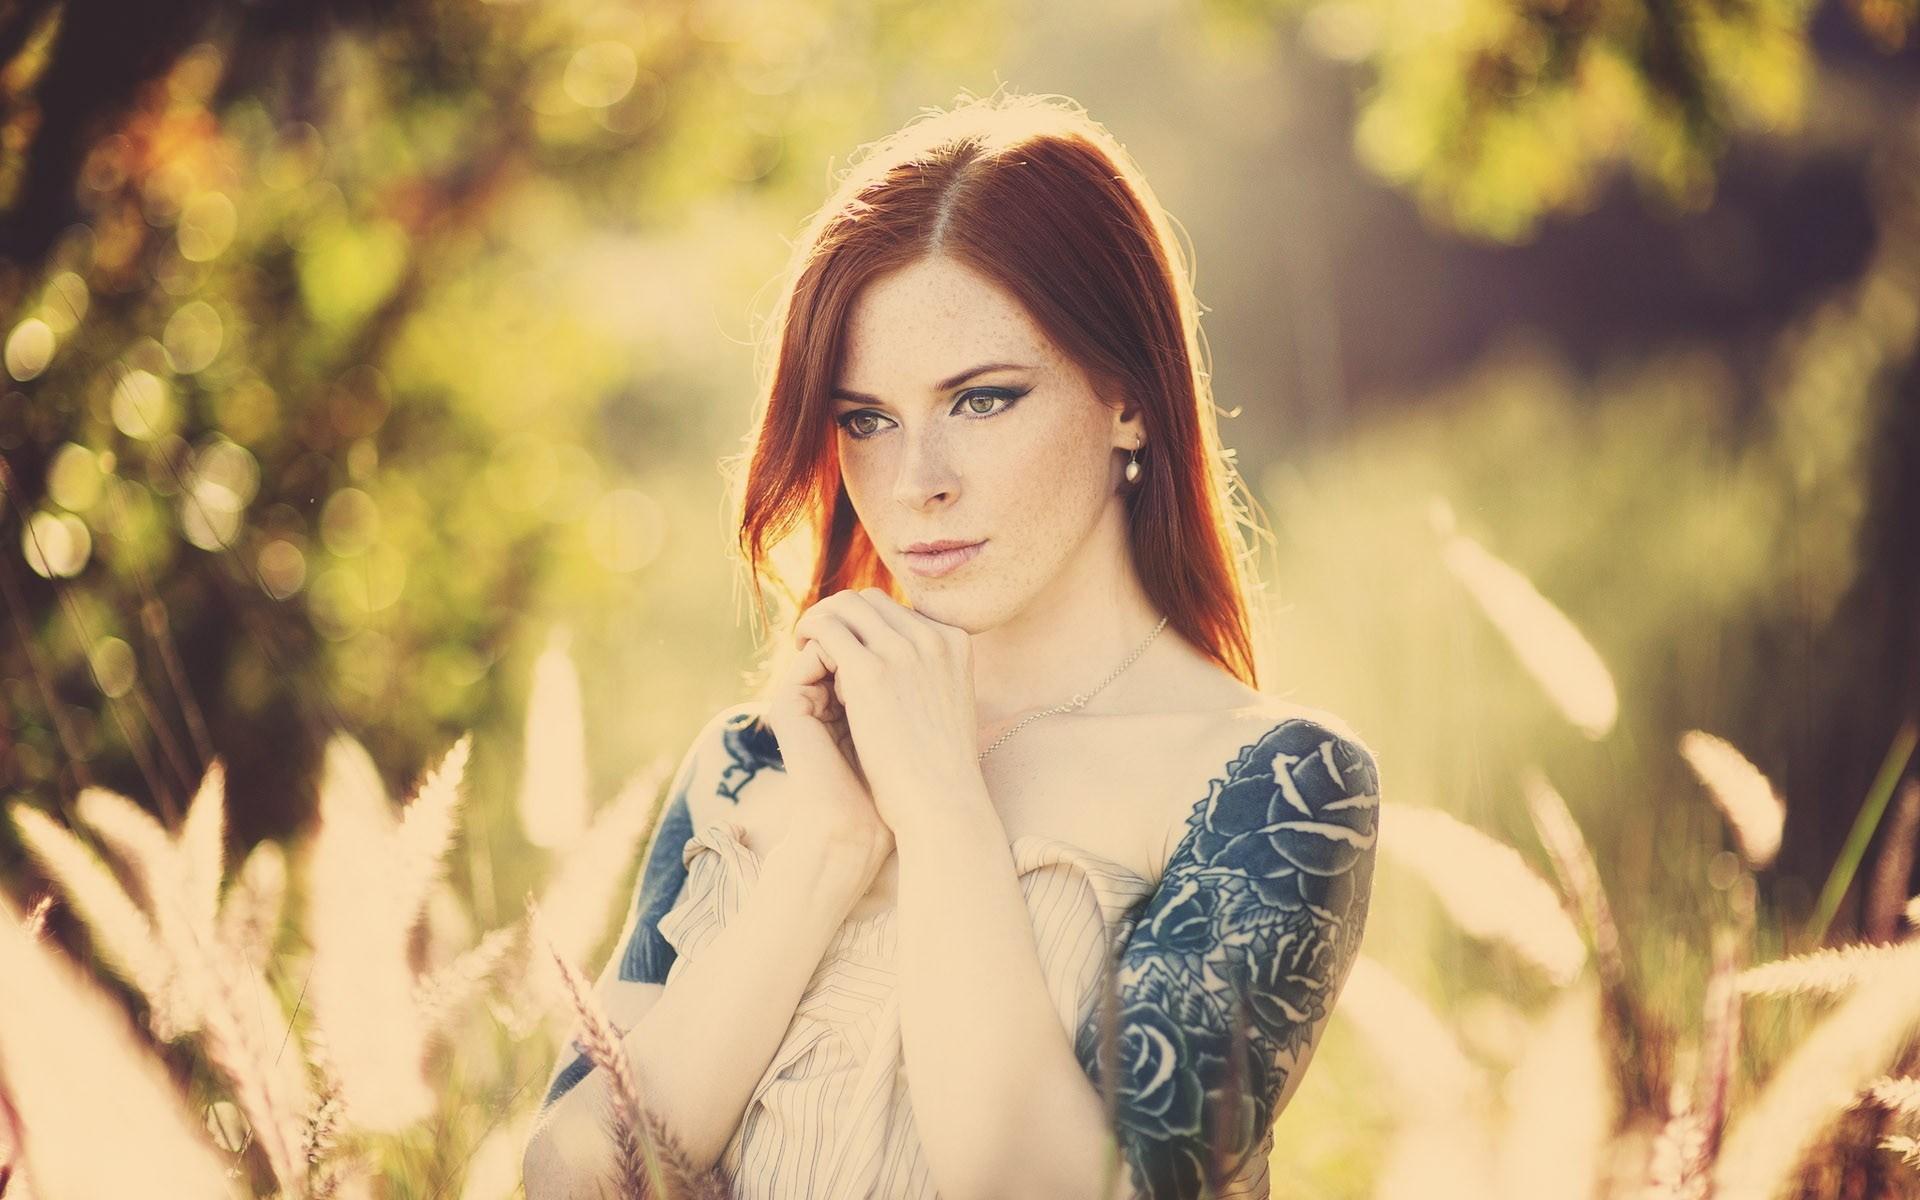 Redhead Girl Tattoos Freckles Photo